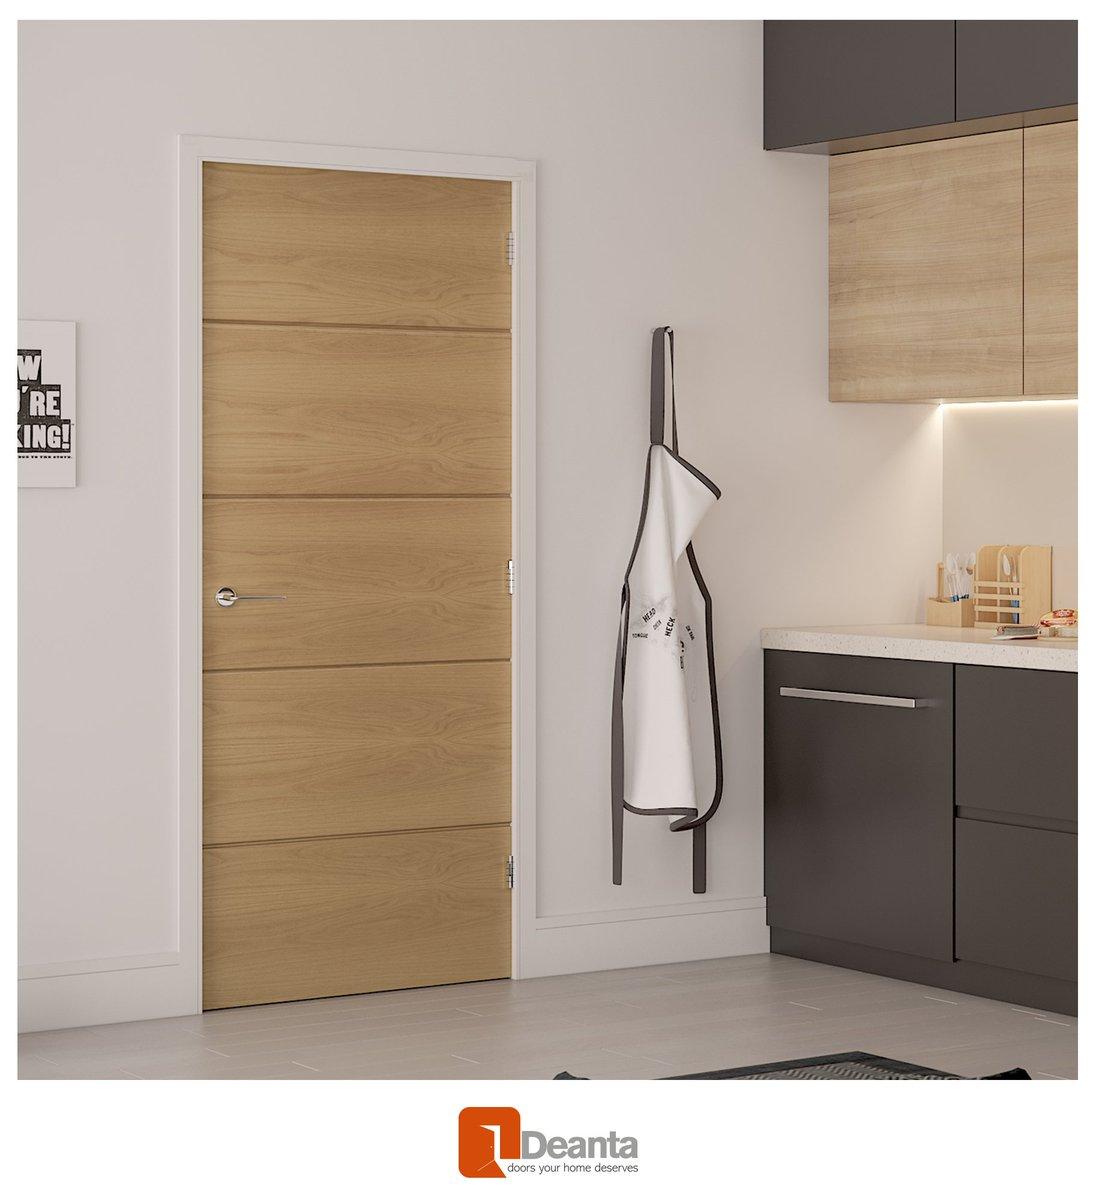 Internal doors external doors and spray finishes from oakwood doors - Oakwood Doors Ltd Added Deanta Deantadoorsuk